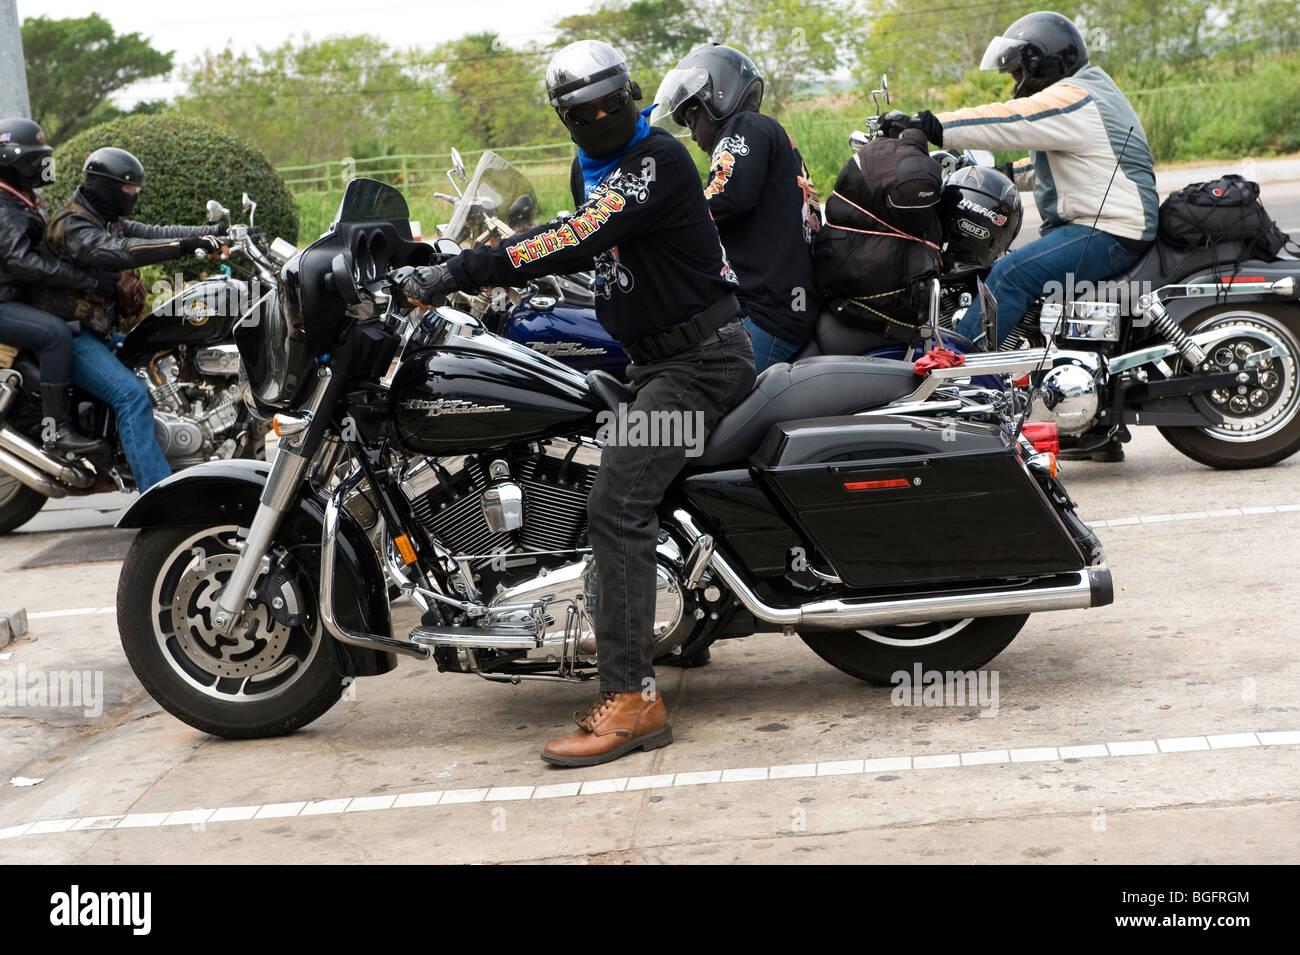 thai harley davidson gangster Stock Photo: 27392644 - Alamy